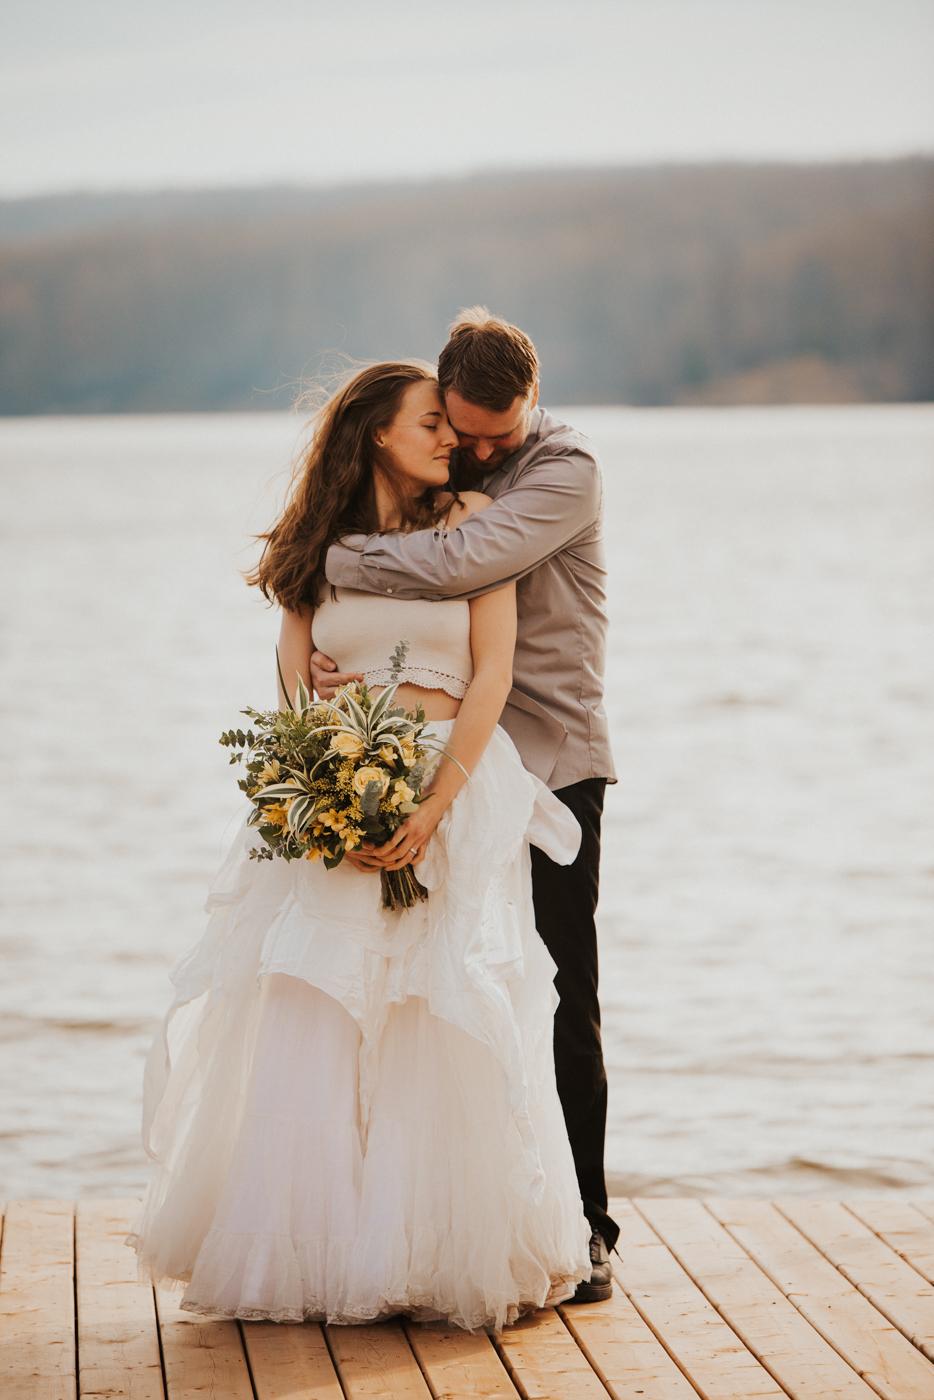 FortSt.John_photographer_TyraEPhotography_Wedding_Couple_Family_Photograhy_DawsonCreek_Elopement_Bride_Boduoir_Portraits-11.jpg